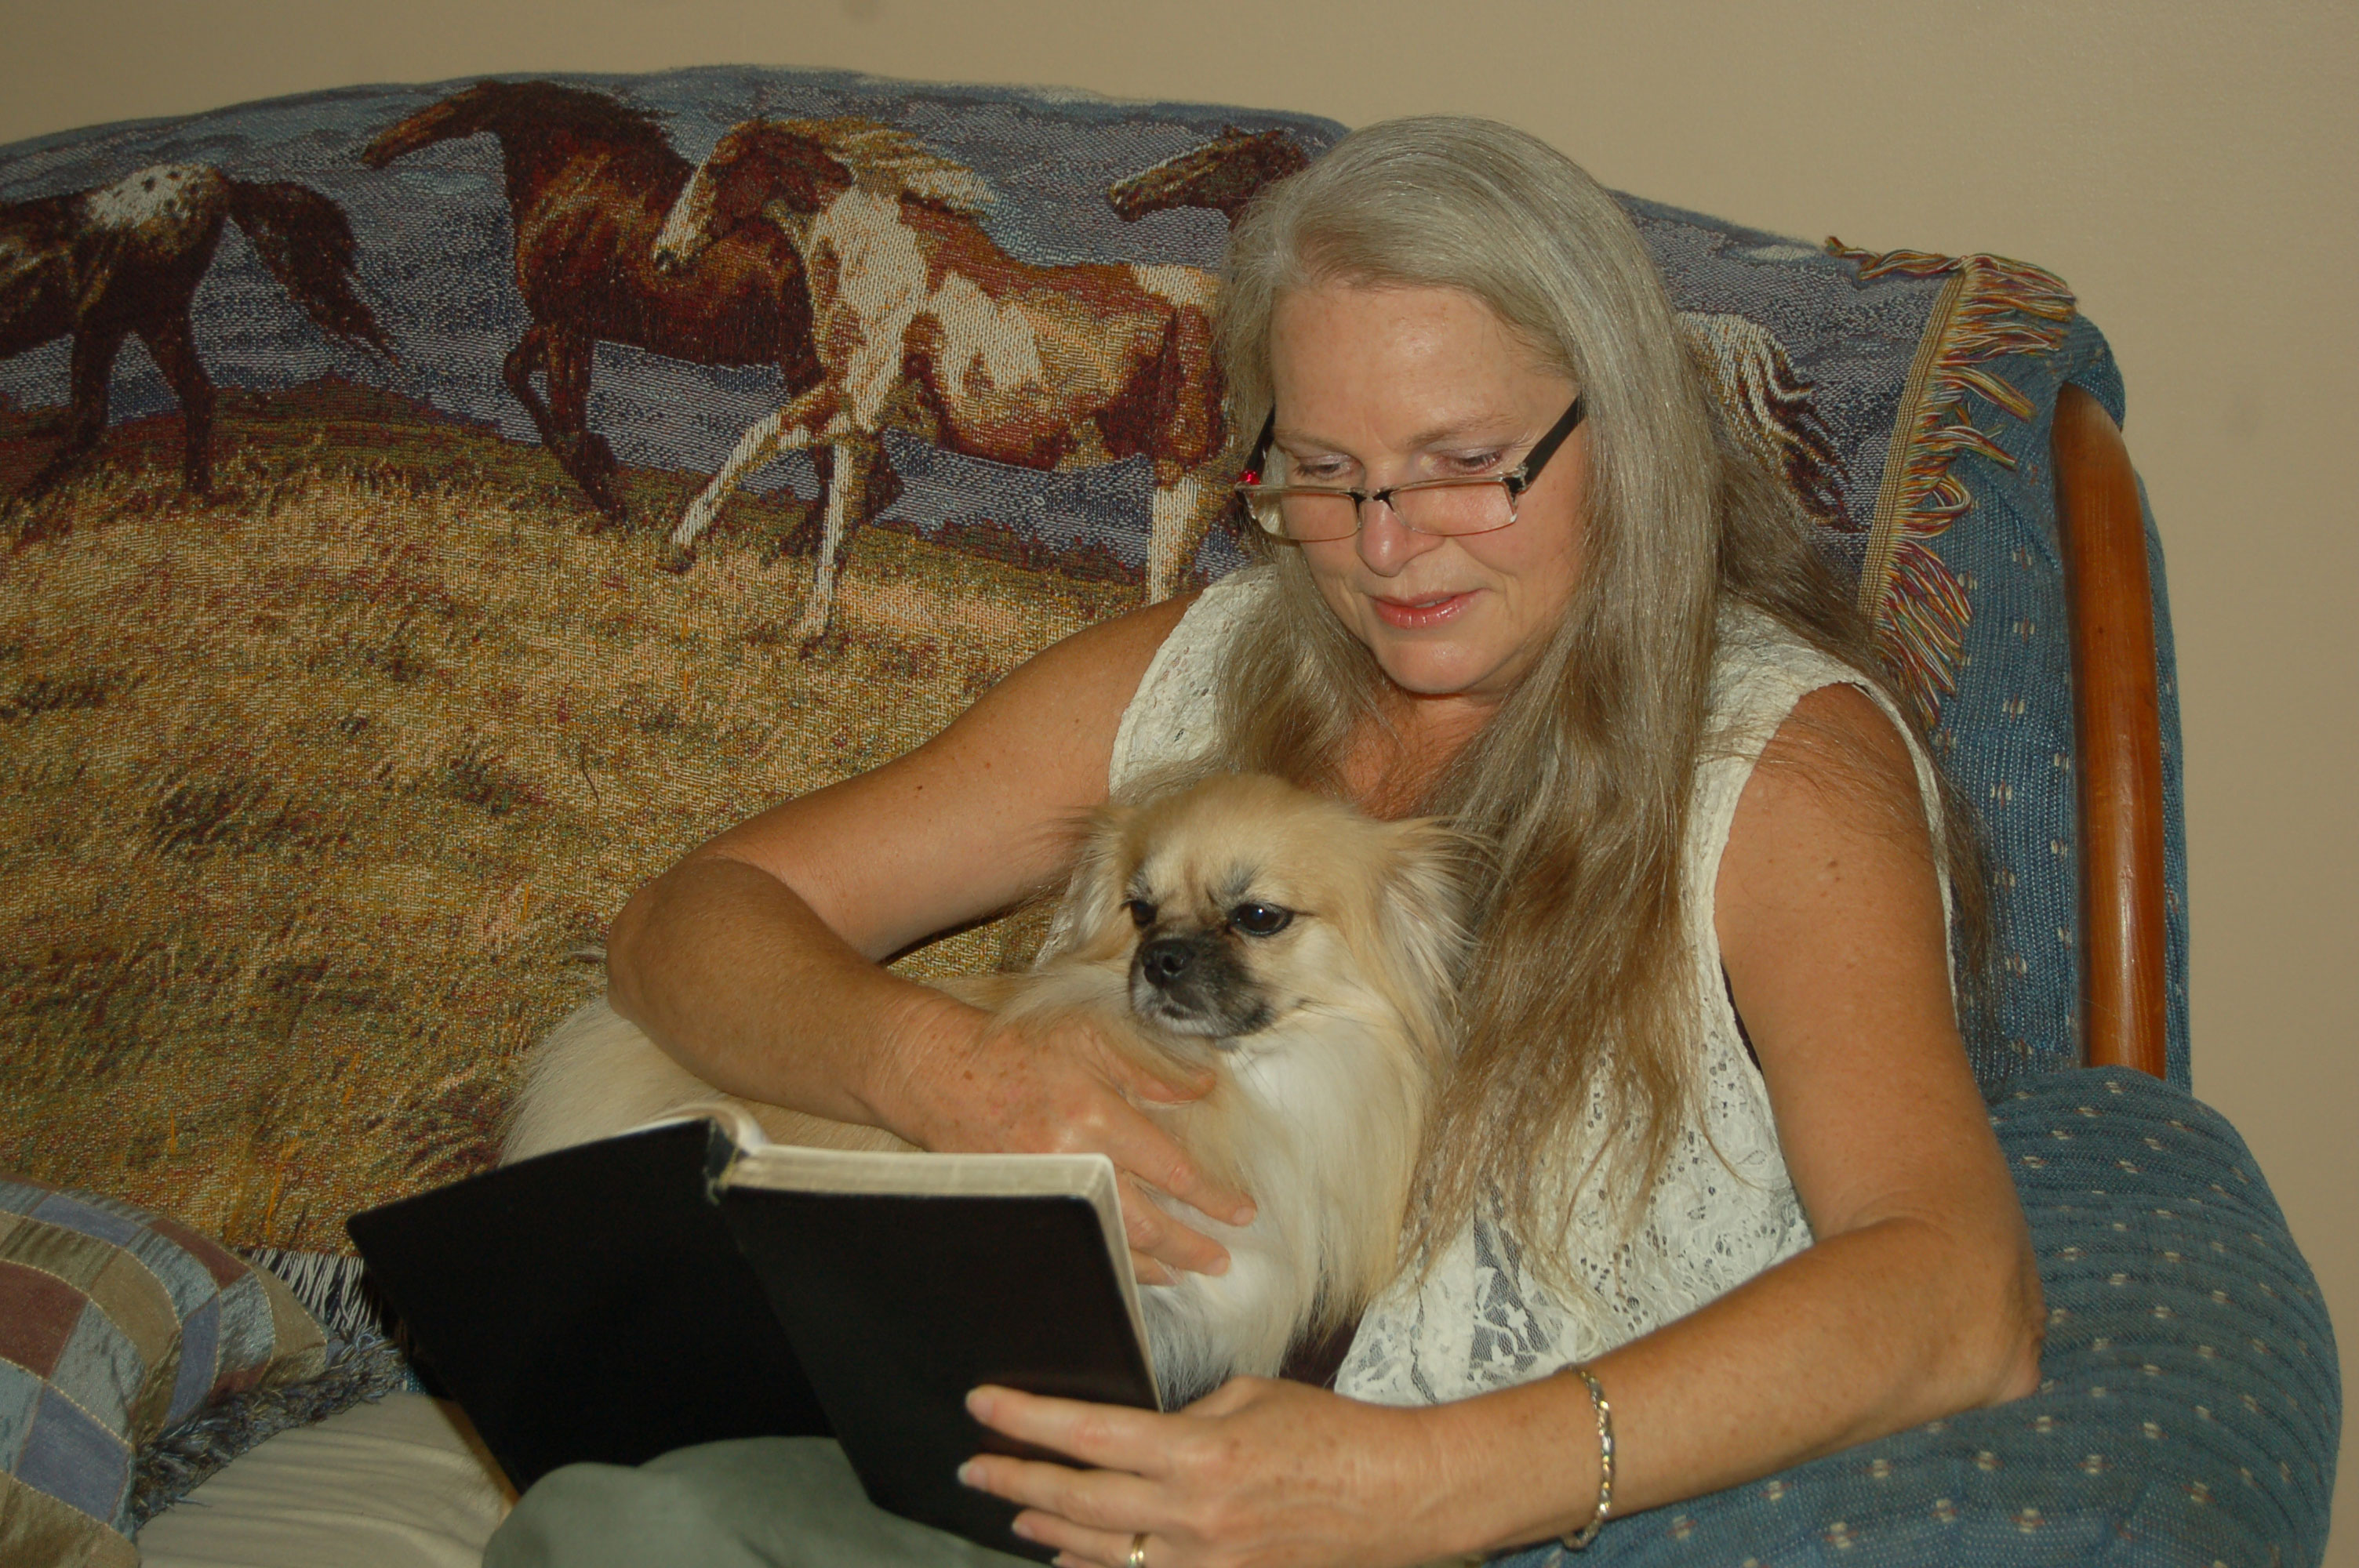 Christian Stock Photos by Linda Bateman - Woman Reading Bible while Sitting on Sofa, with Dog